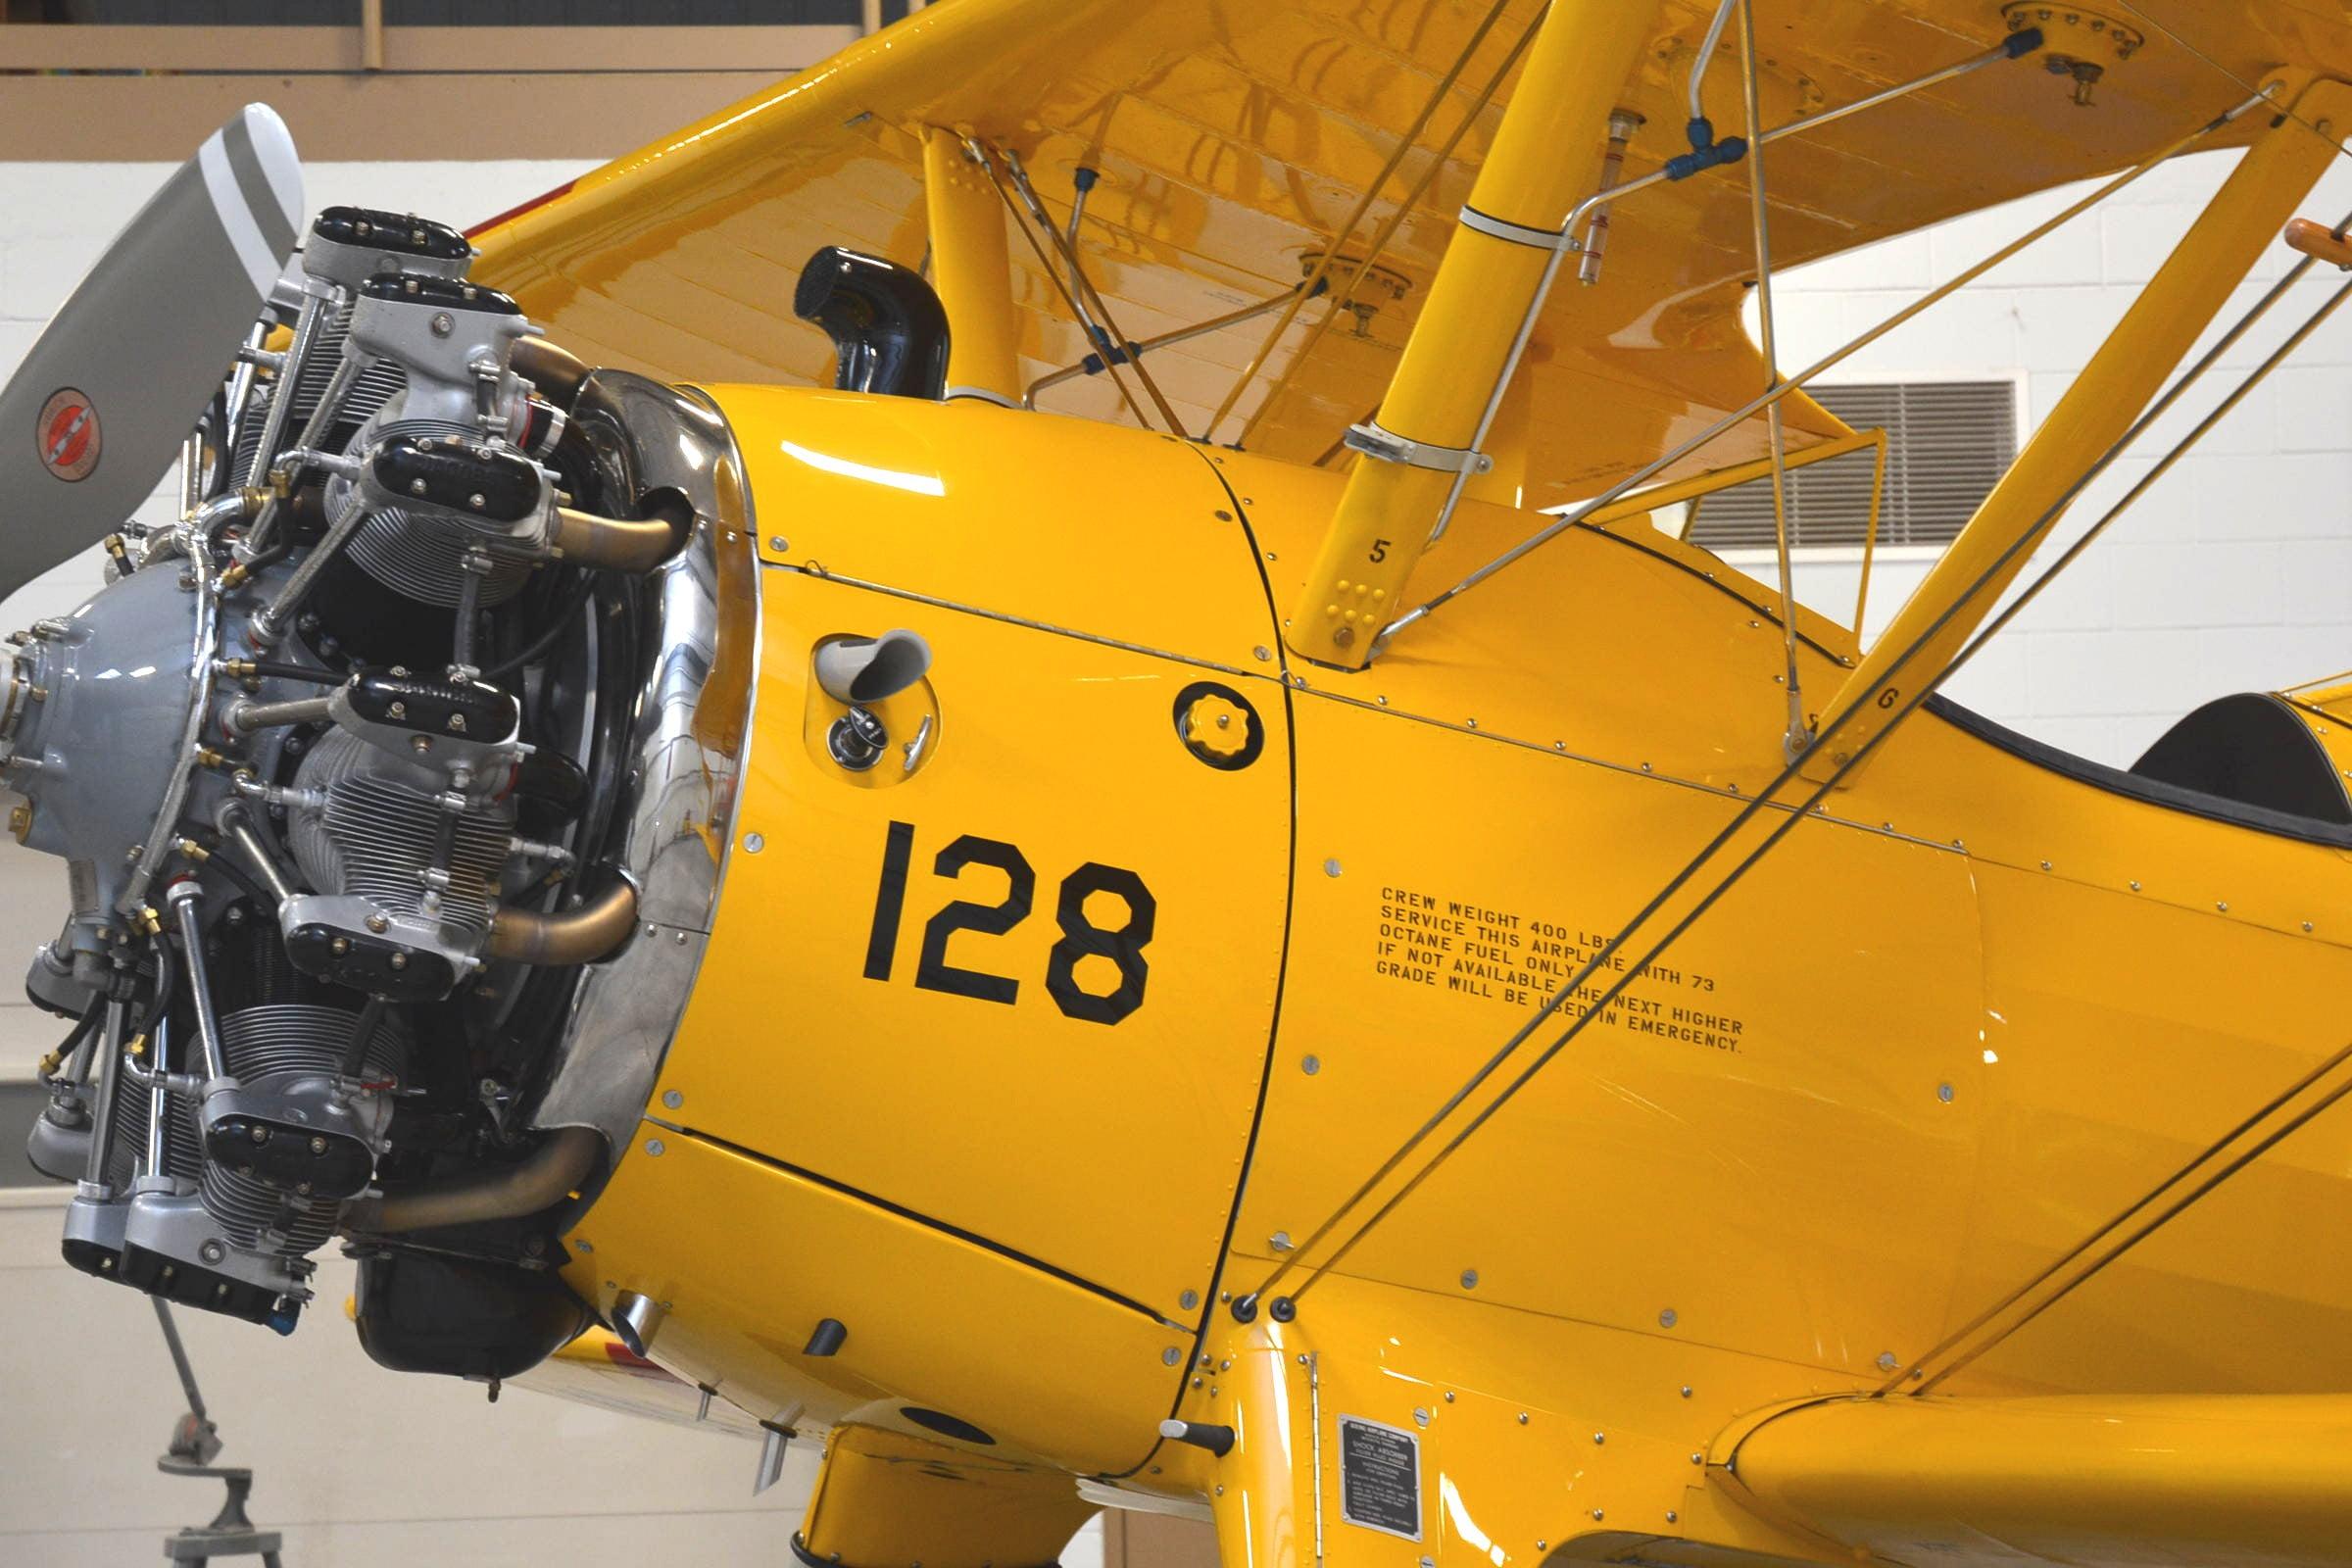 Stearman Jacobs Engine Conversion Rare Aircraft